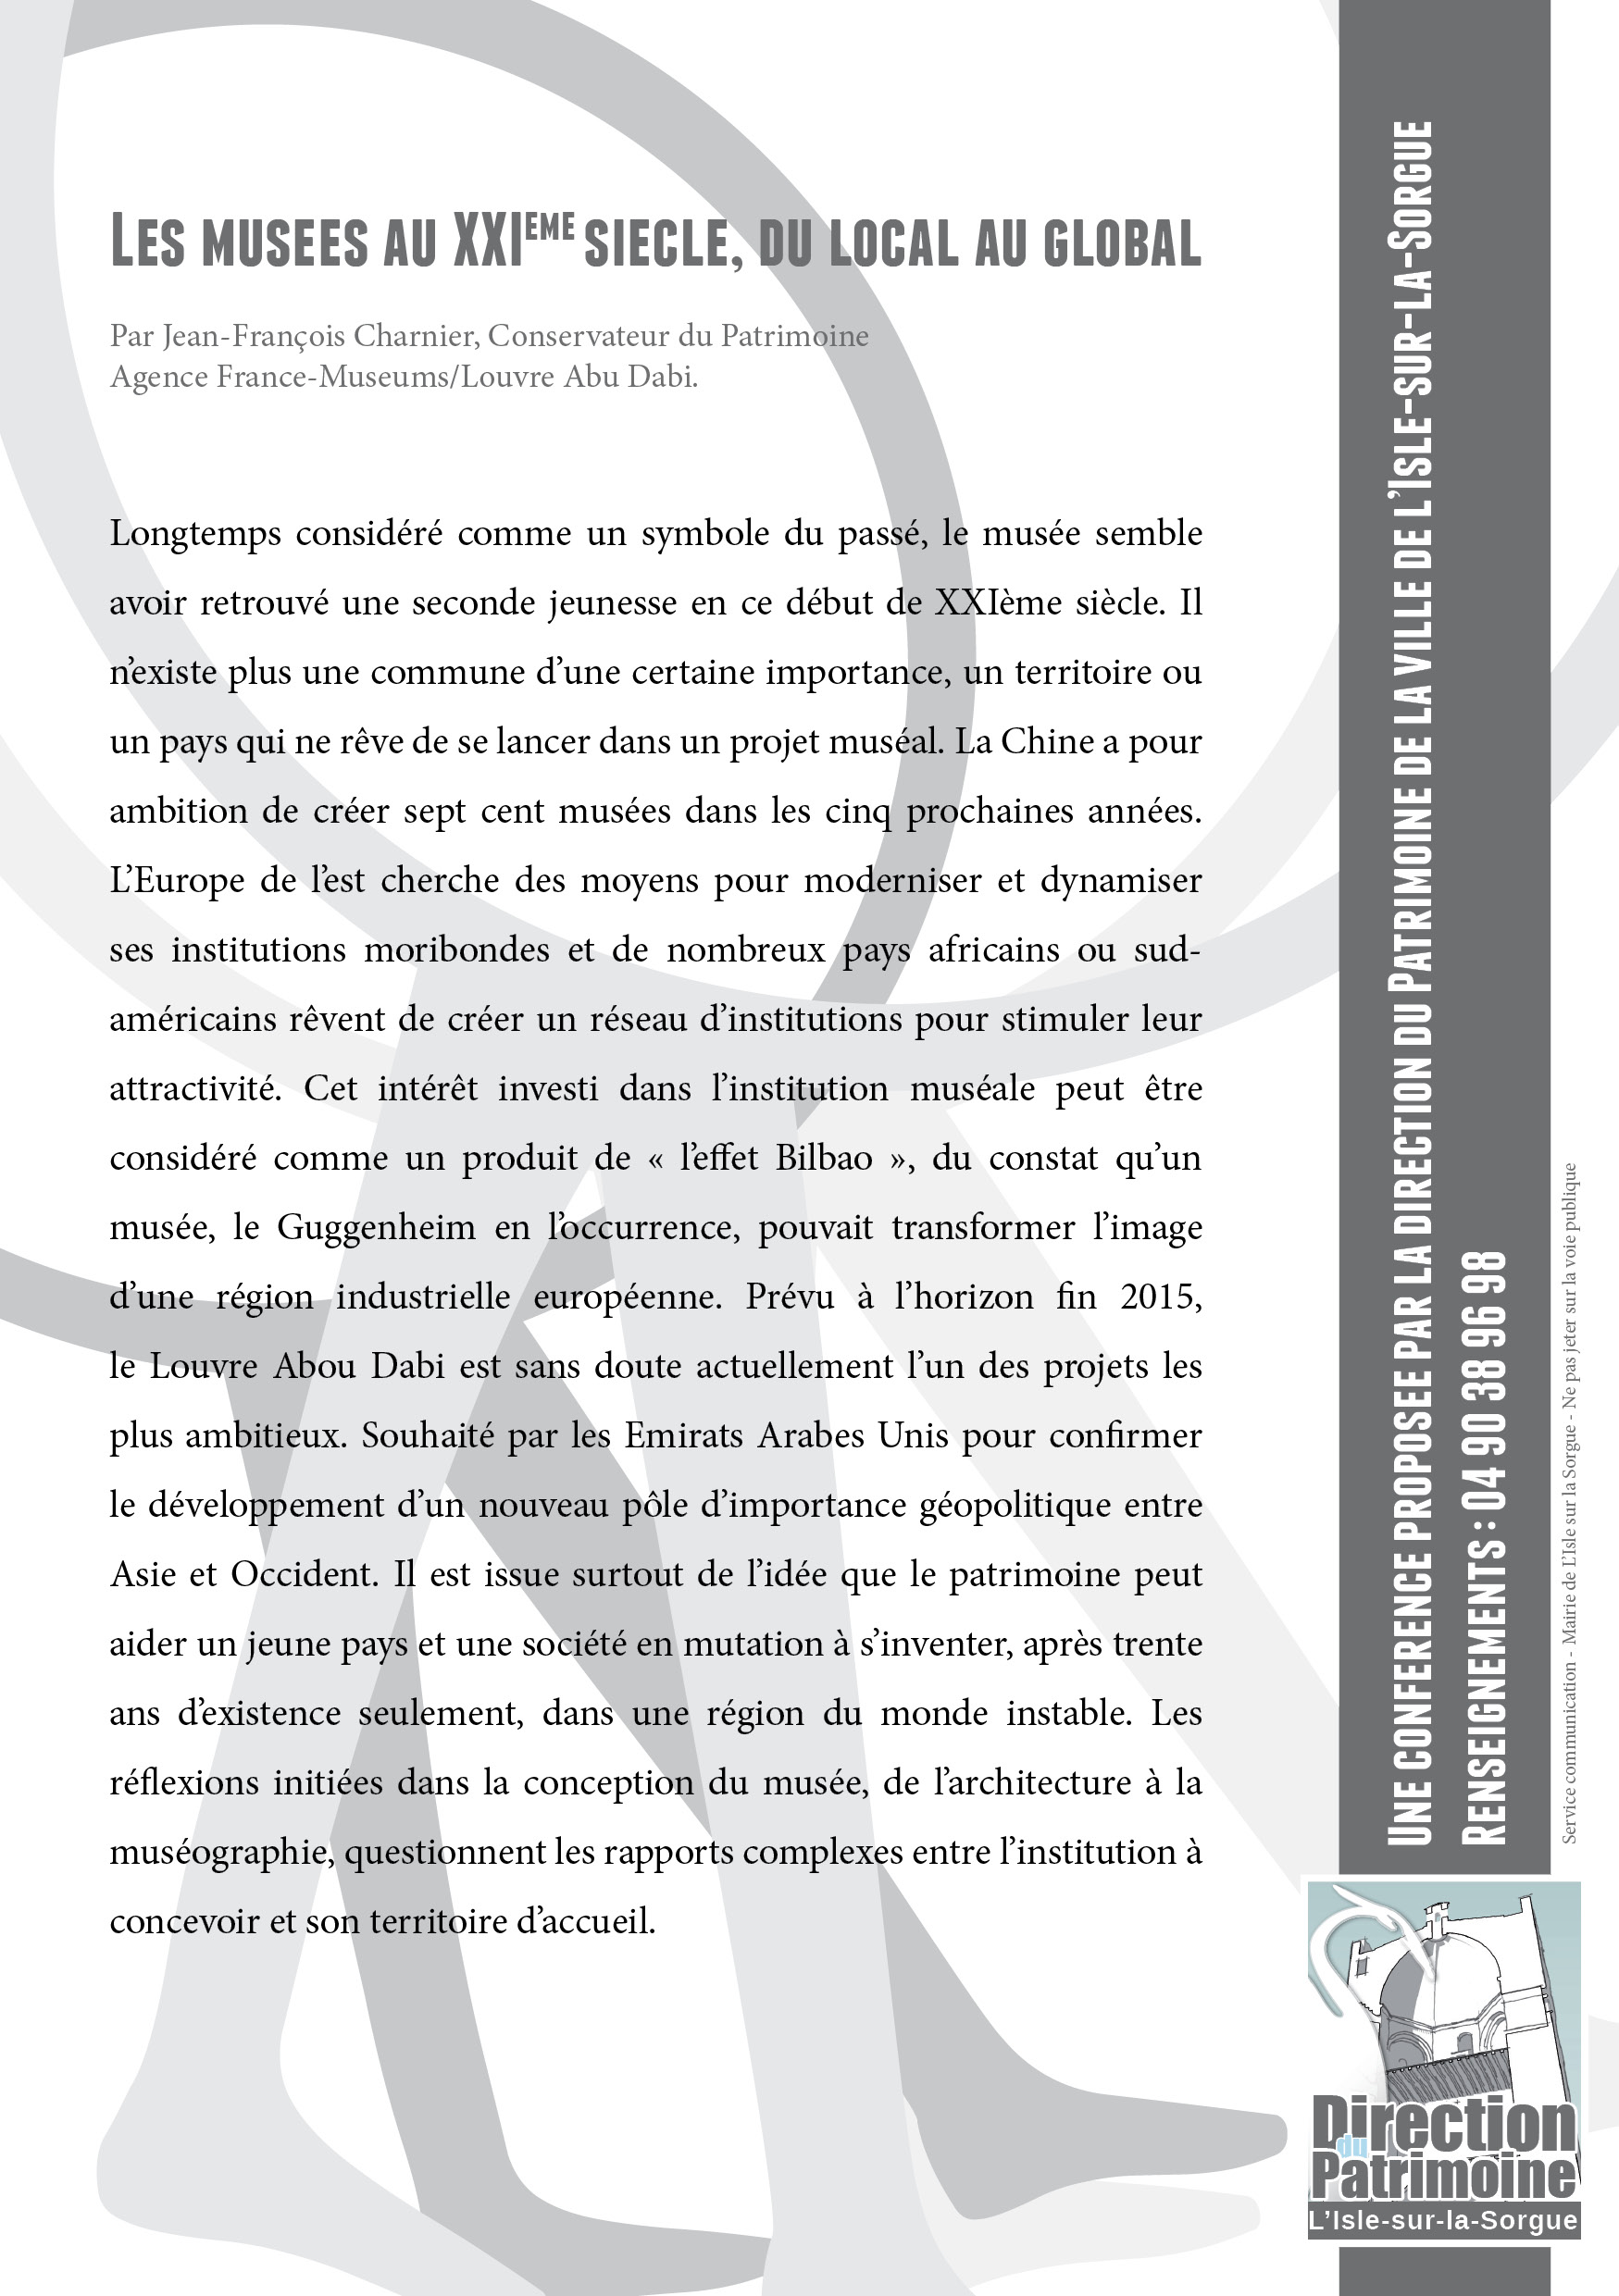 flyer MUSEES AU XXIe SIECLE (1)